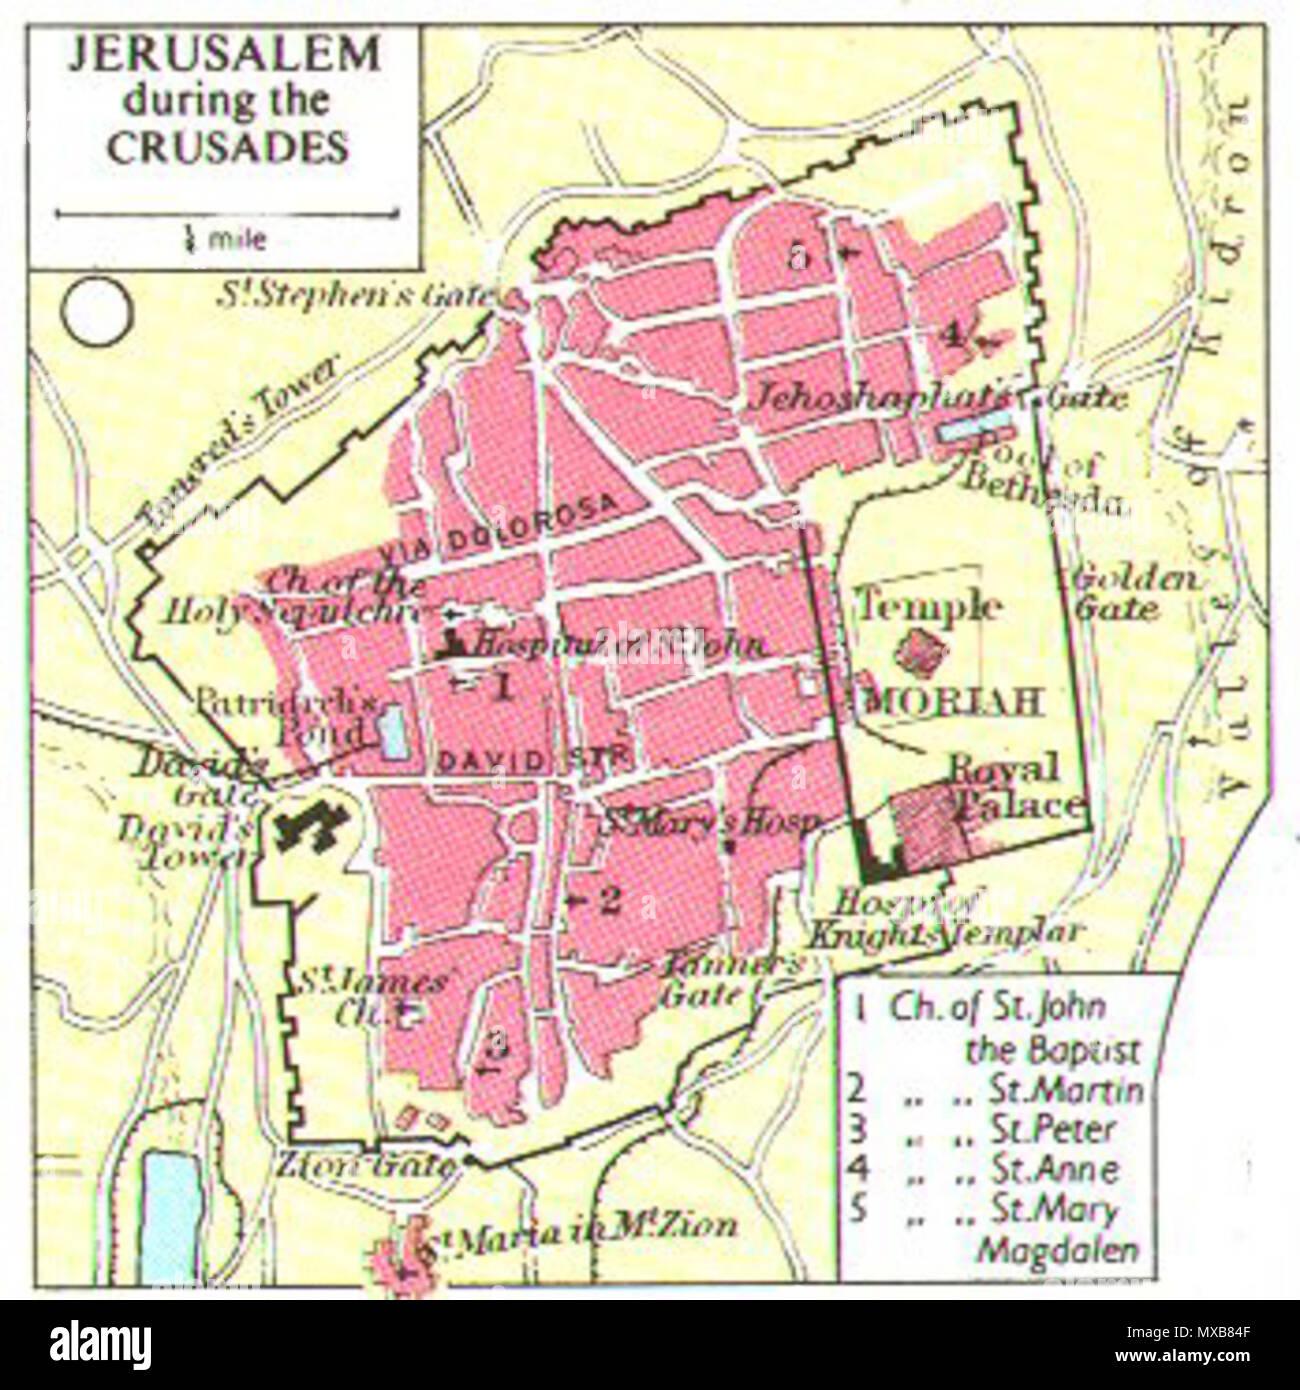 Jerusalem Karte Deutsch.English Jerusalem During The Crusades Deutsch Stadtplan Jerusalems